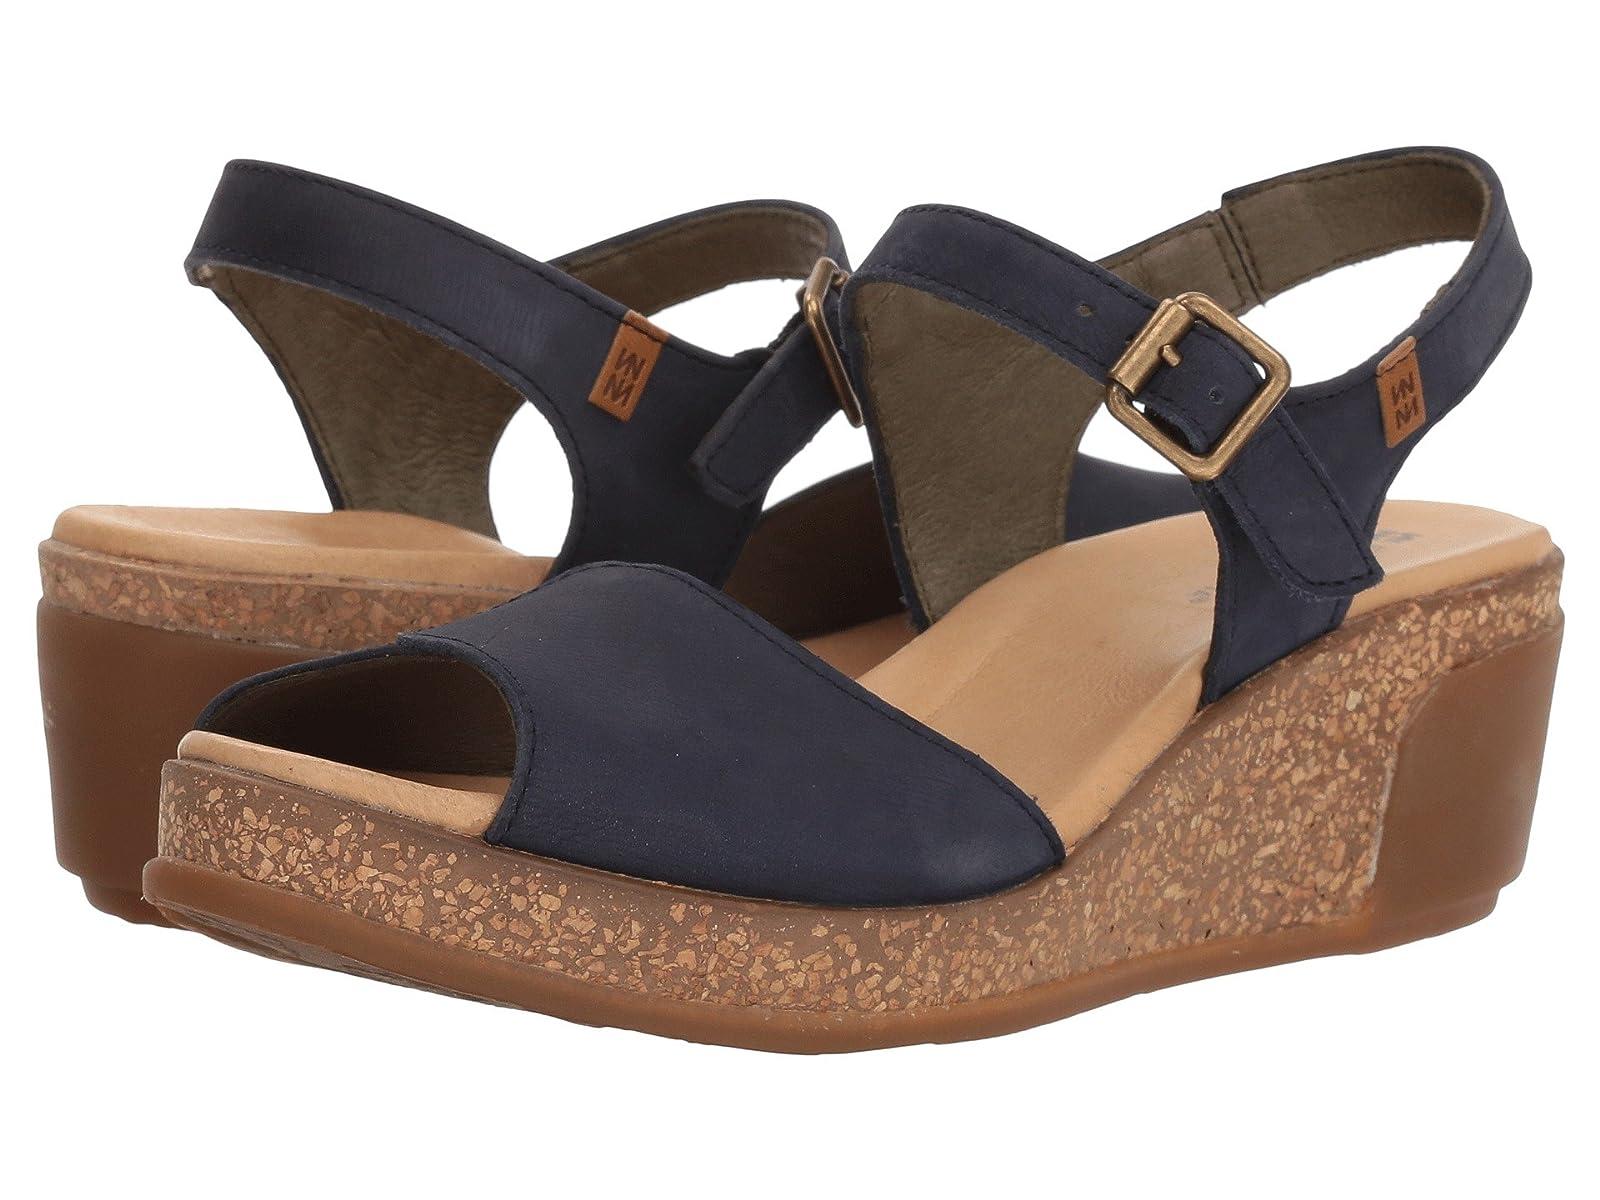 El Naturalista Leaves N5000Atmospheric grades have affordable shoes